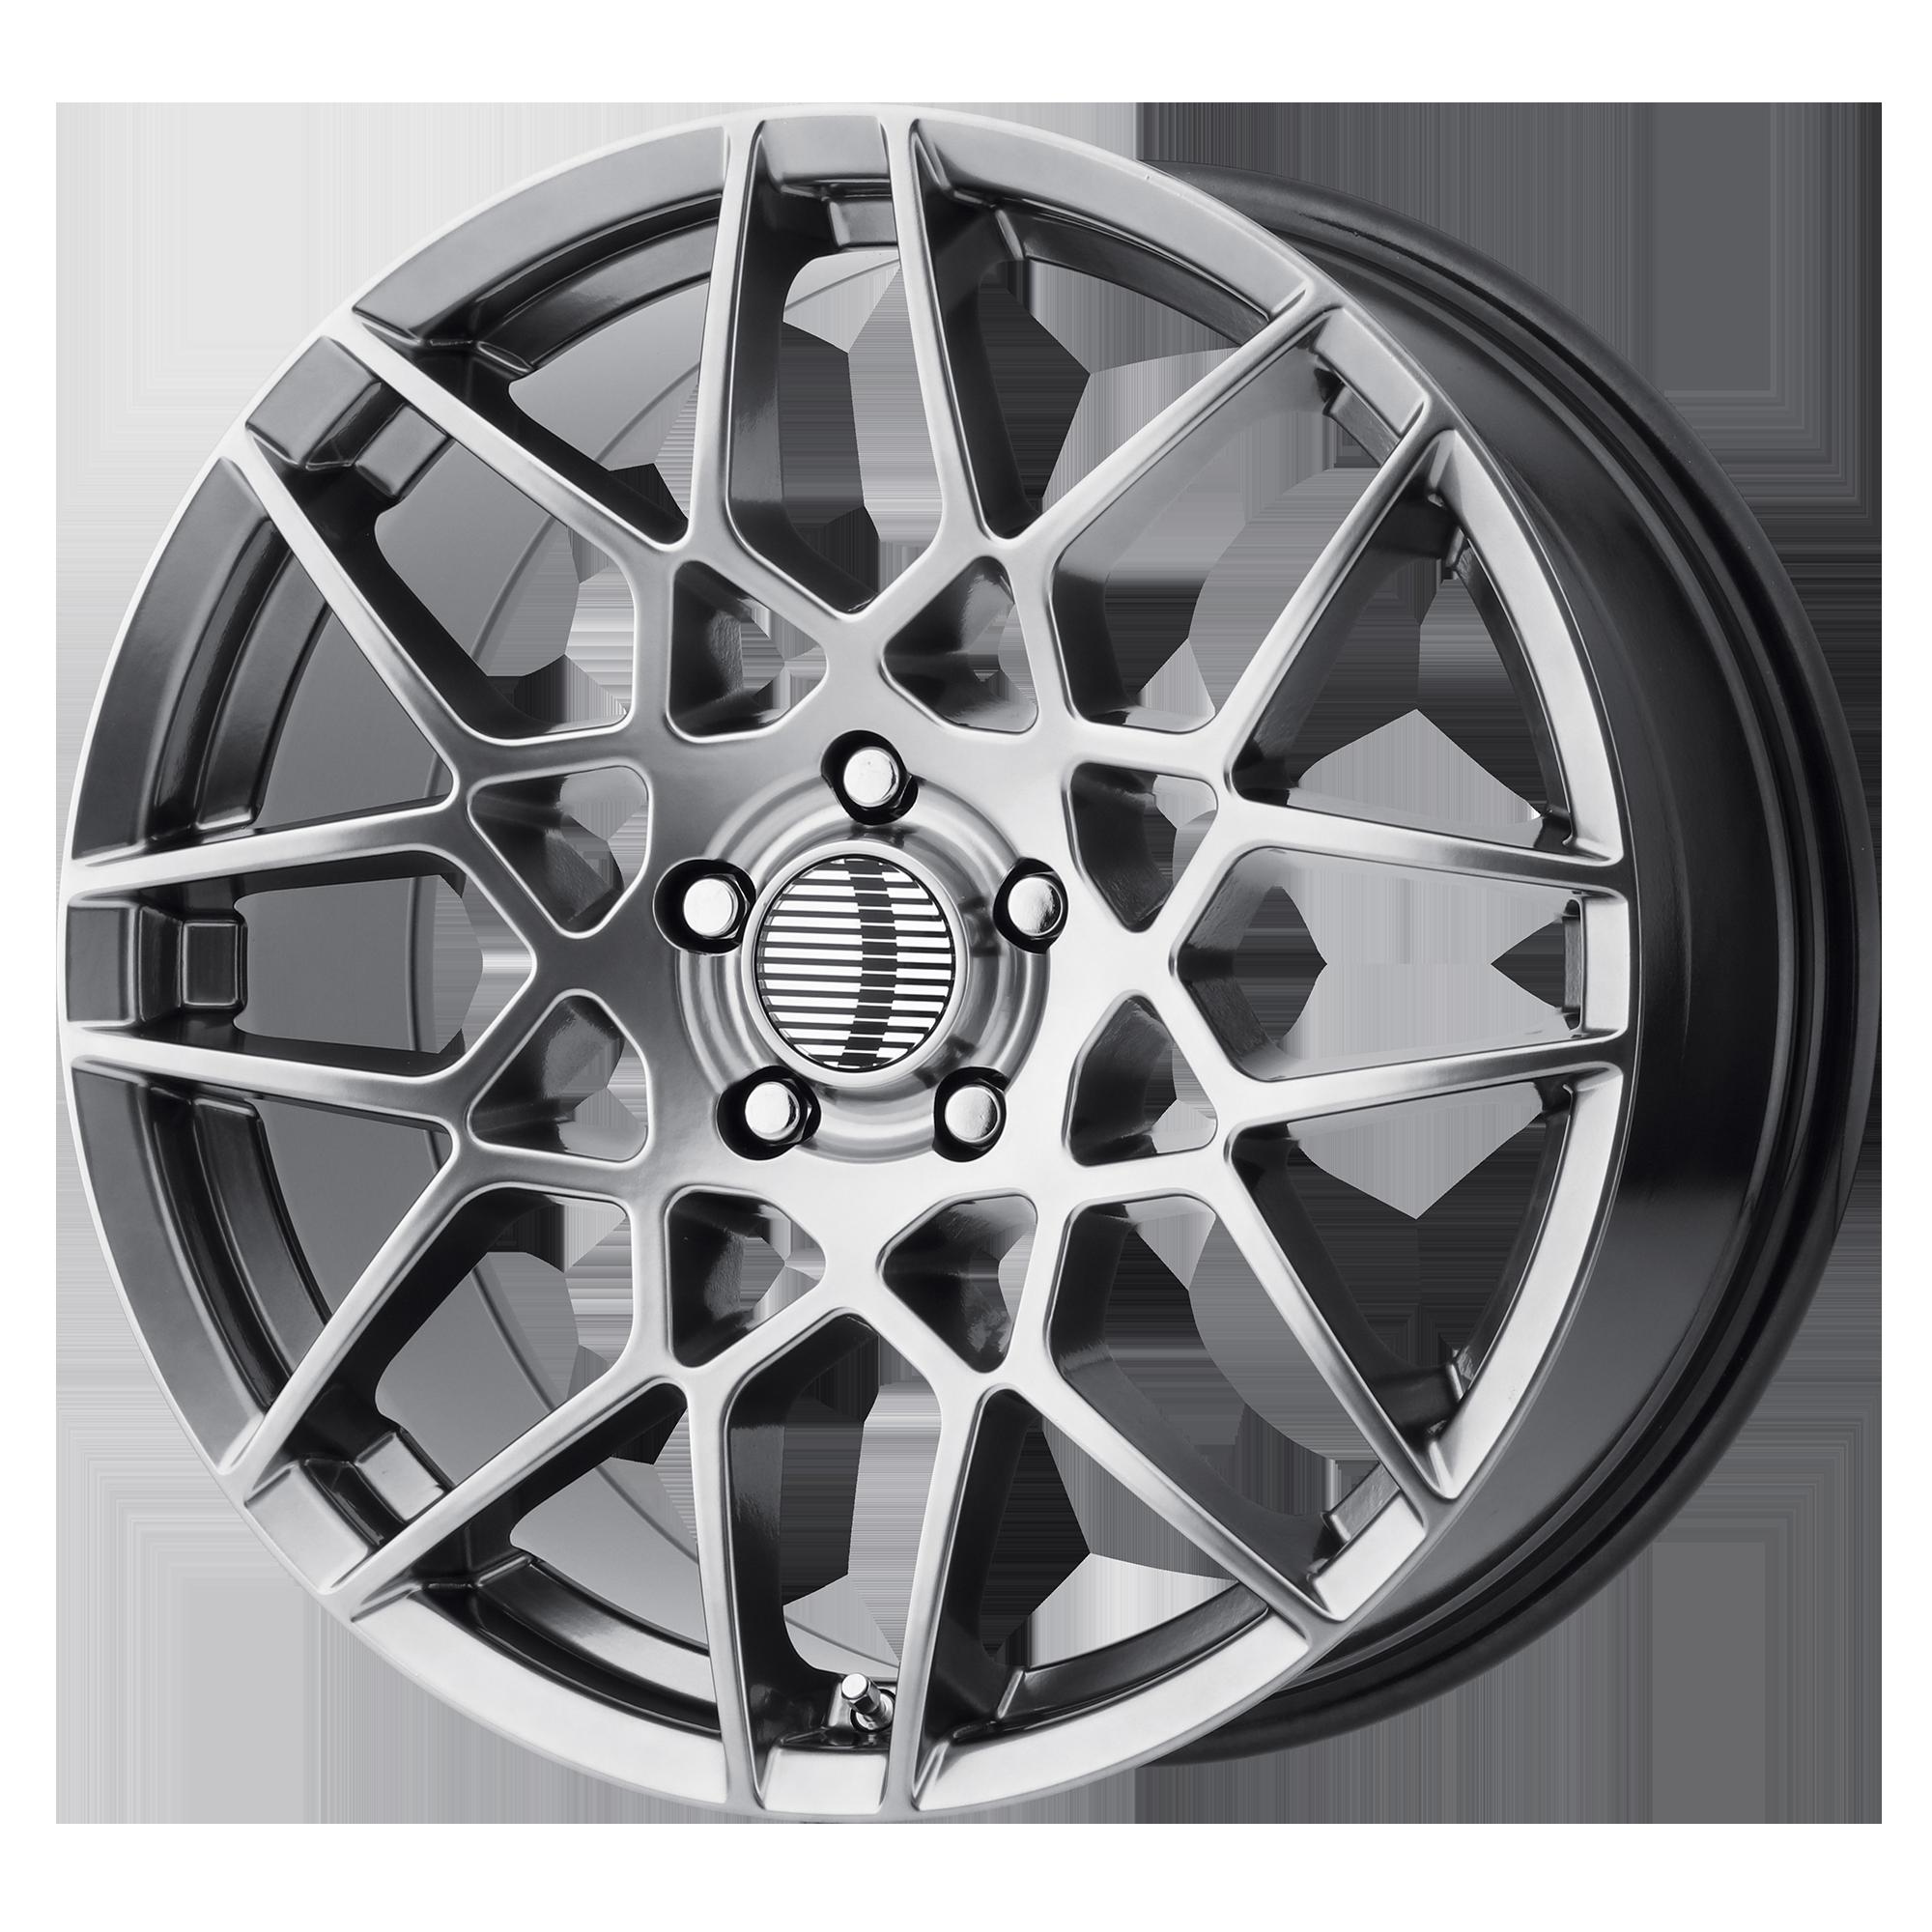 OE Creations Replica Wheels OE Creations PR178 Hyper Silver